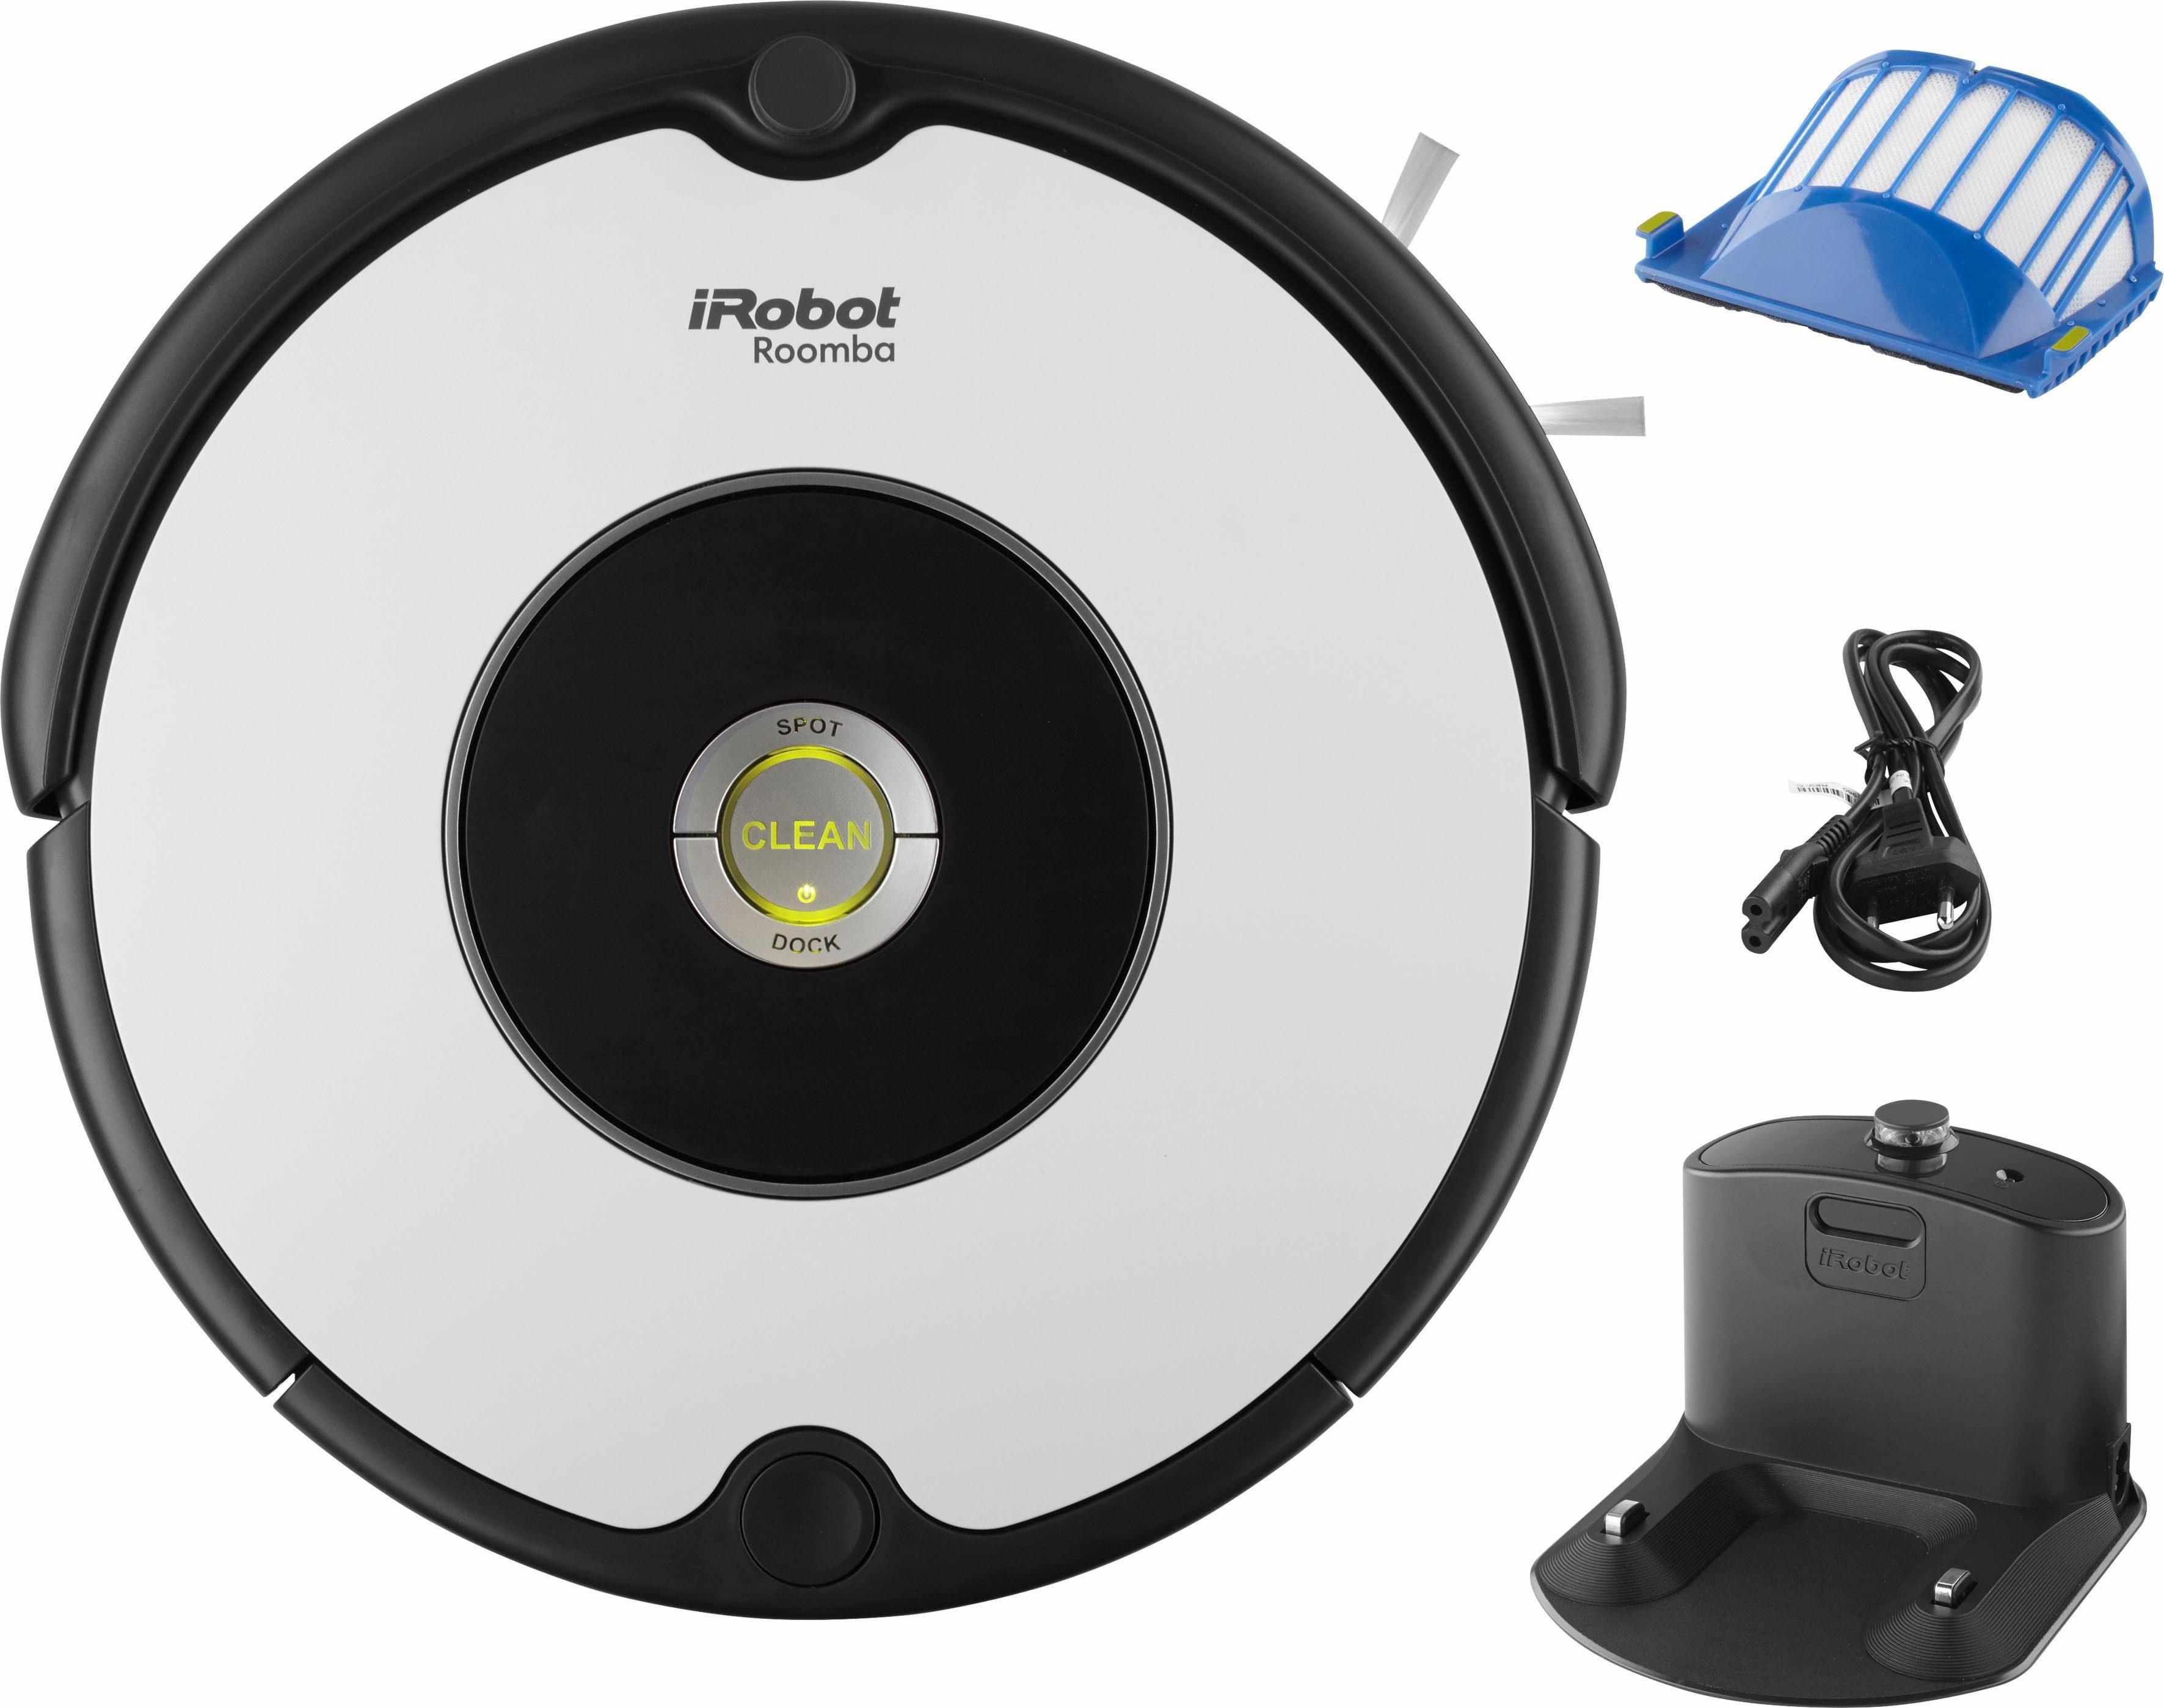 iRobot Saugroboter Roomba 605